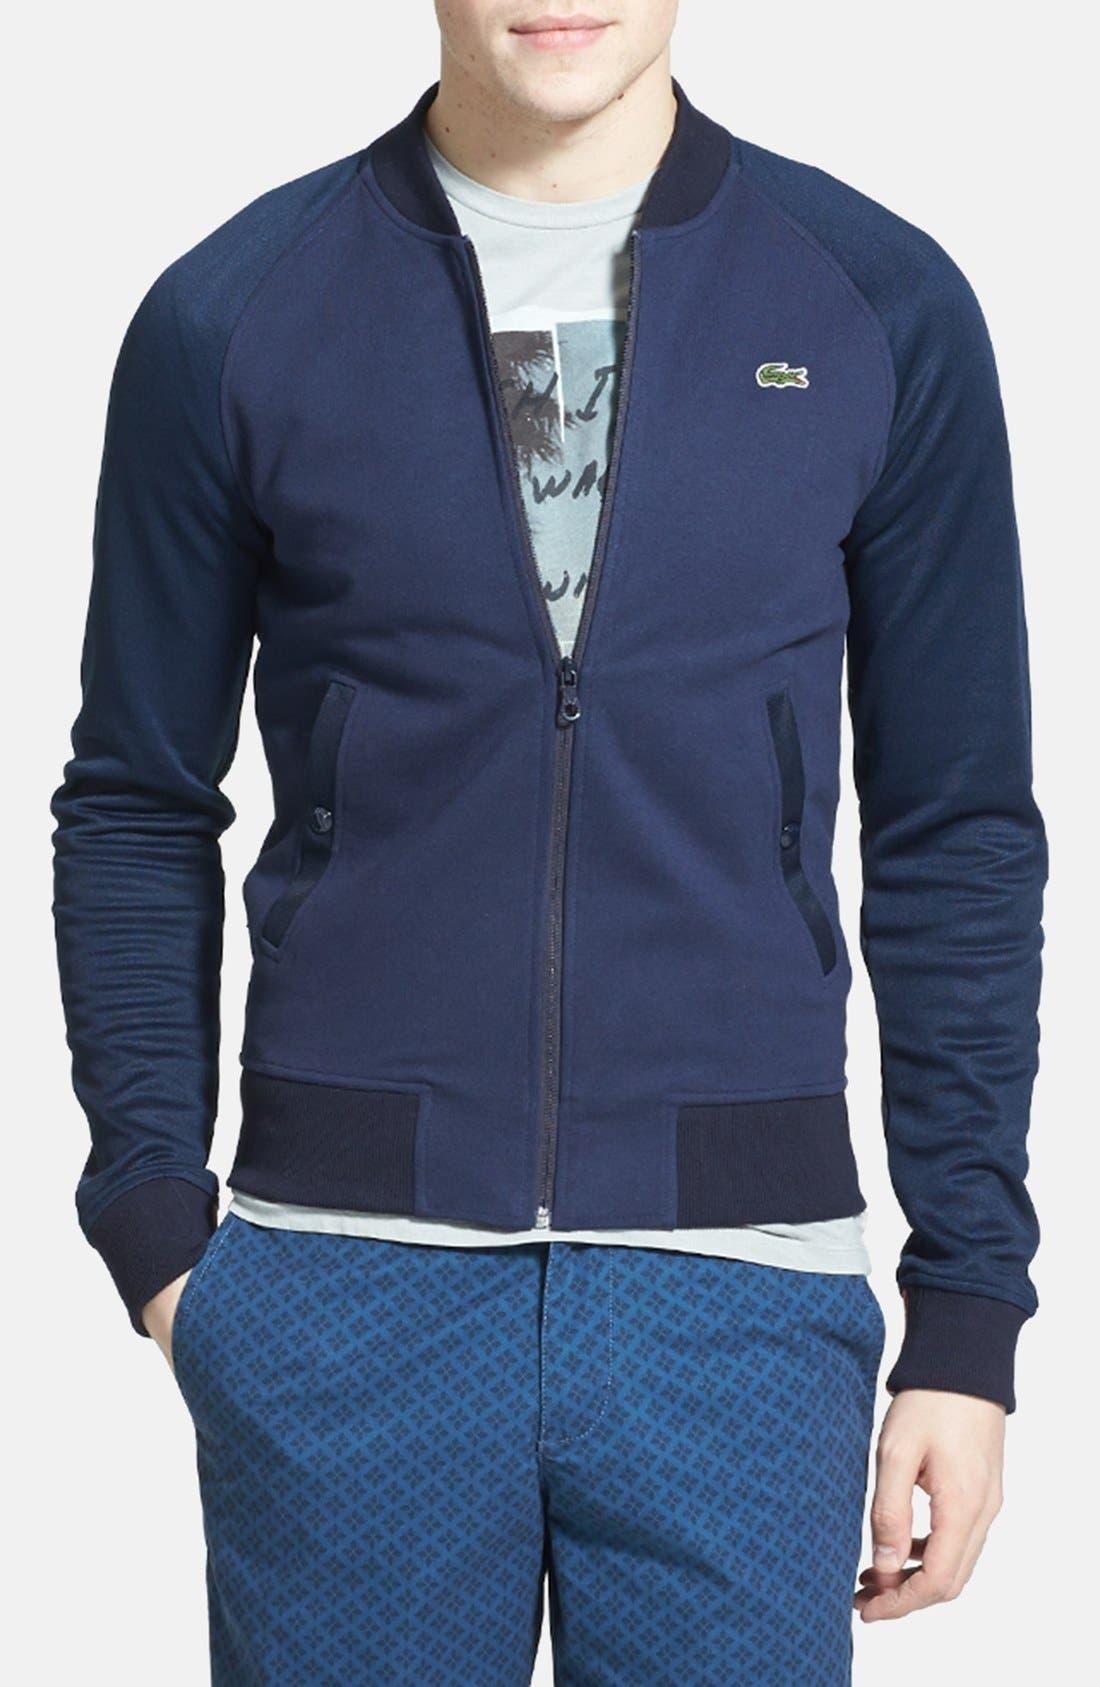 Alternate Image 1 Selected - Lacoste L!VE Zip Track Jacket